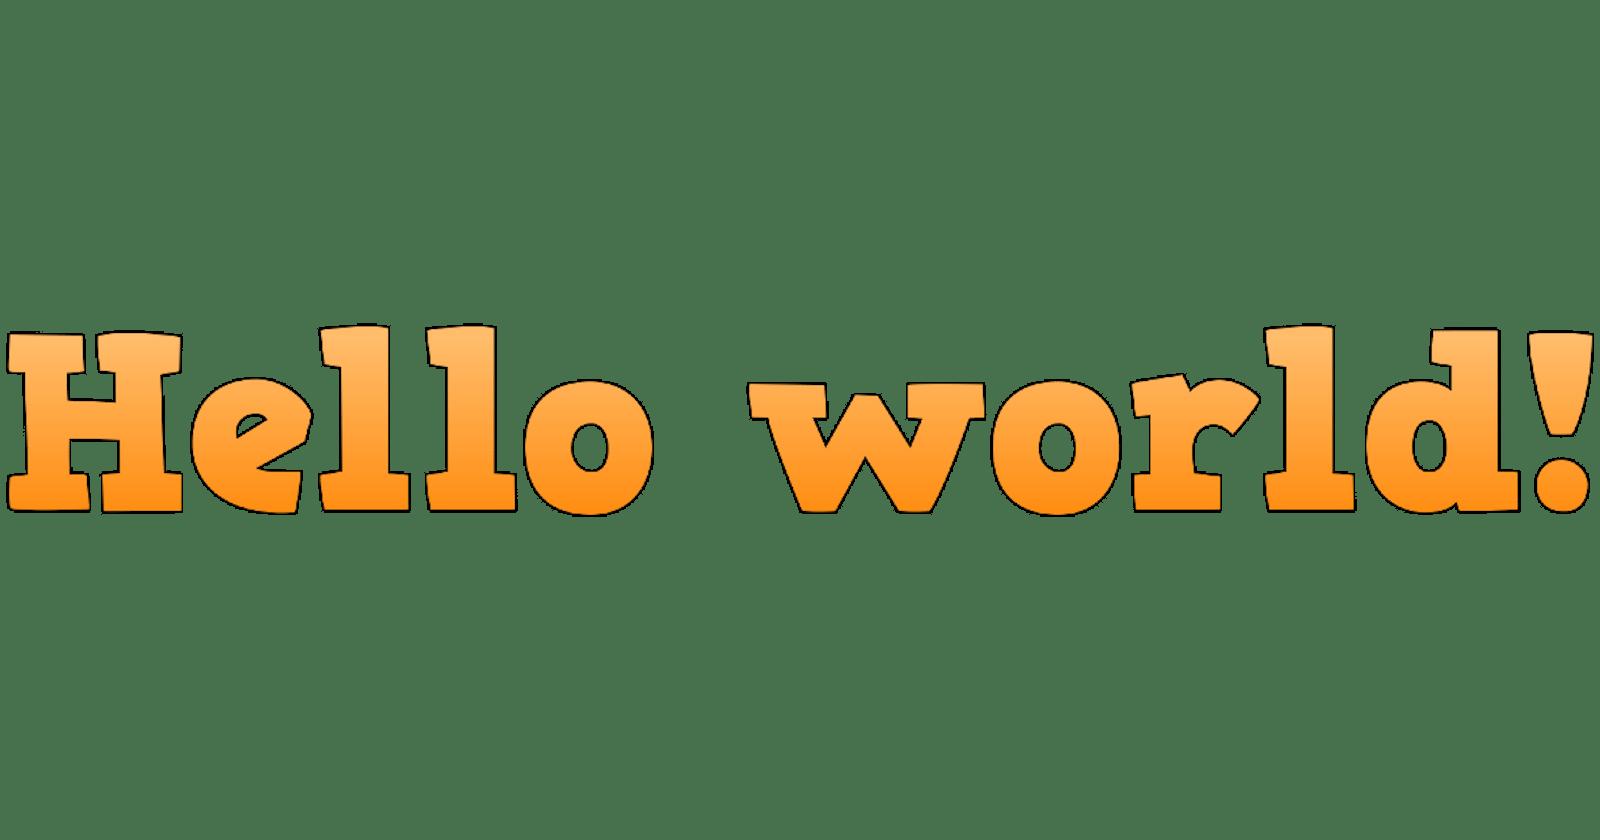 Wondering how 'hello world' started?